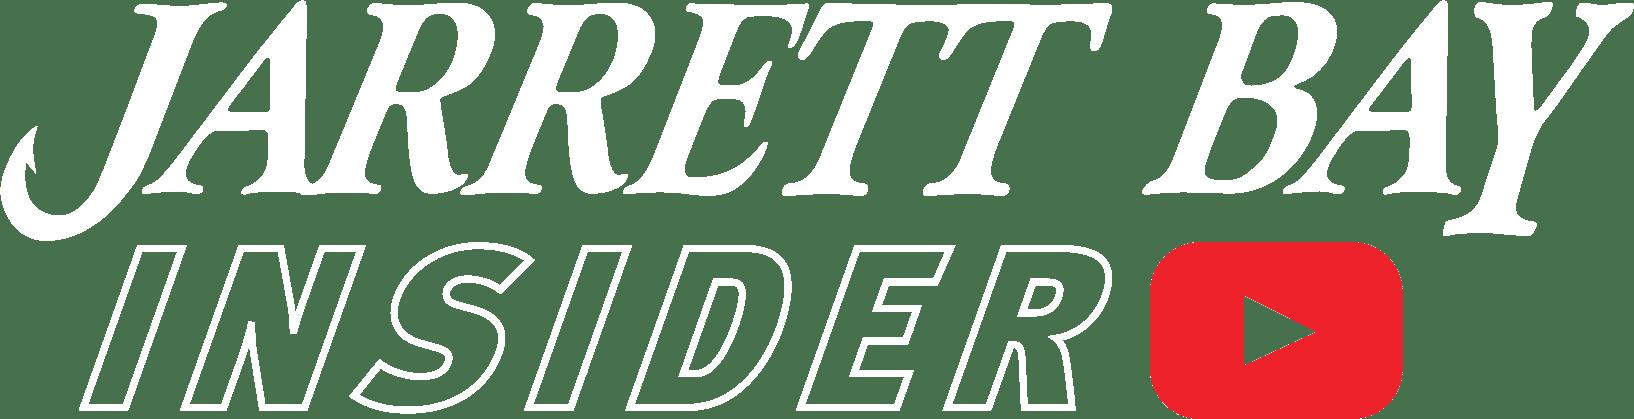 Carolina-Flare-Insider_logo